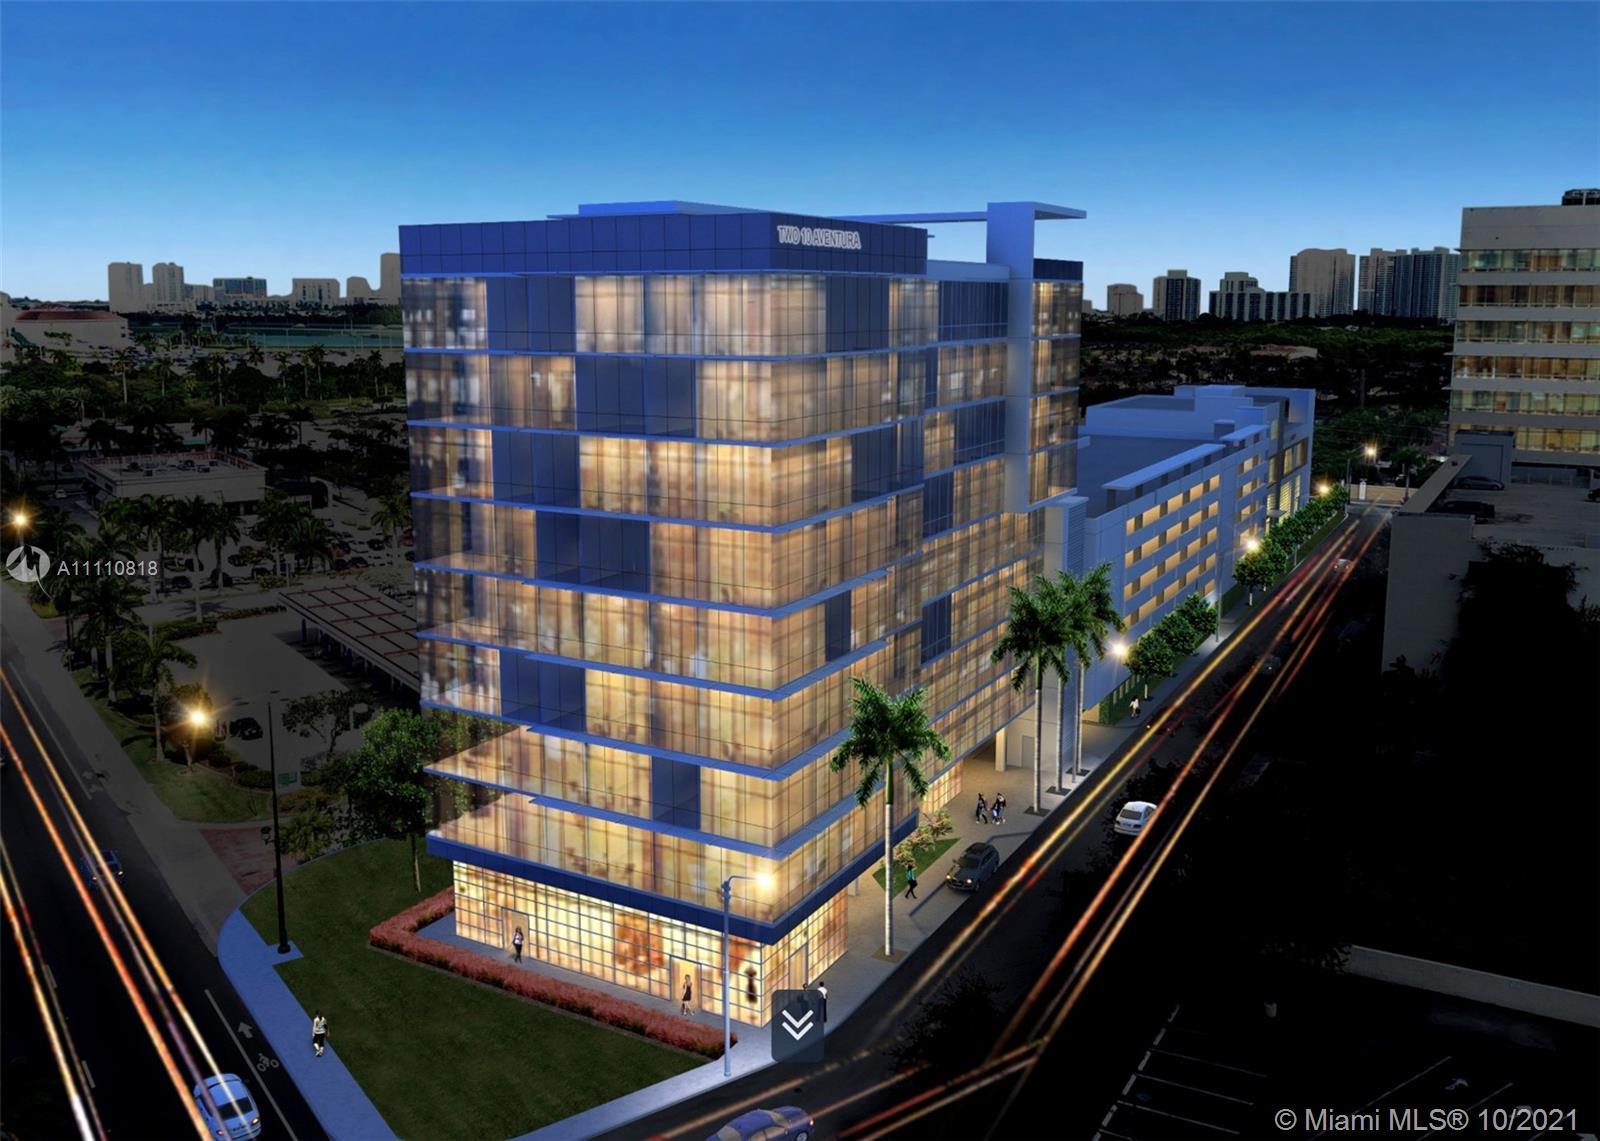 21001 Biscayne Blvd, Unit #201-210 Luxury Real Estate